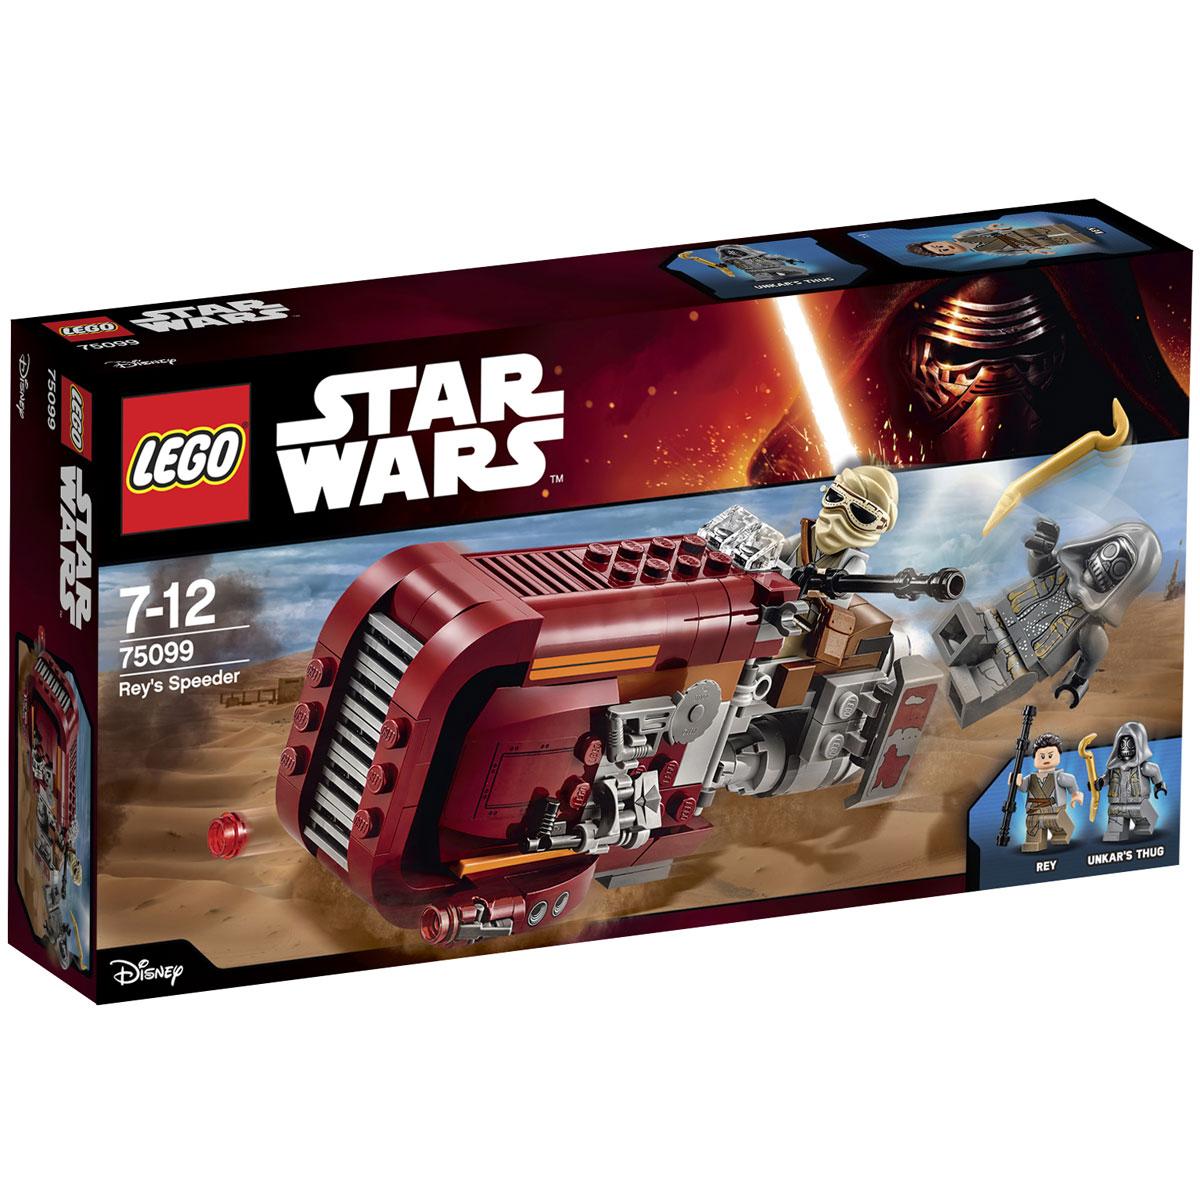 LEGO Star Wars Конструктор Спидер Рей 75099